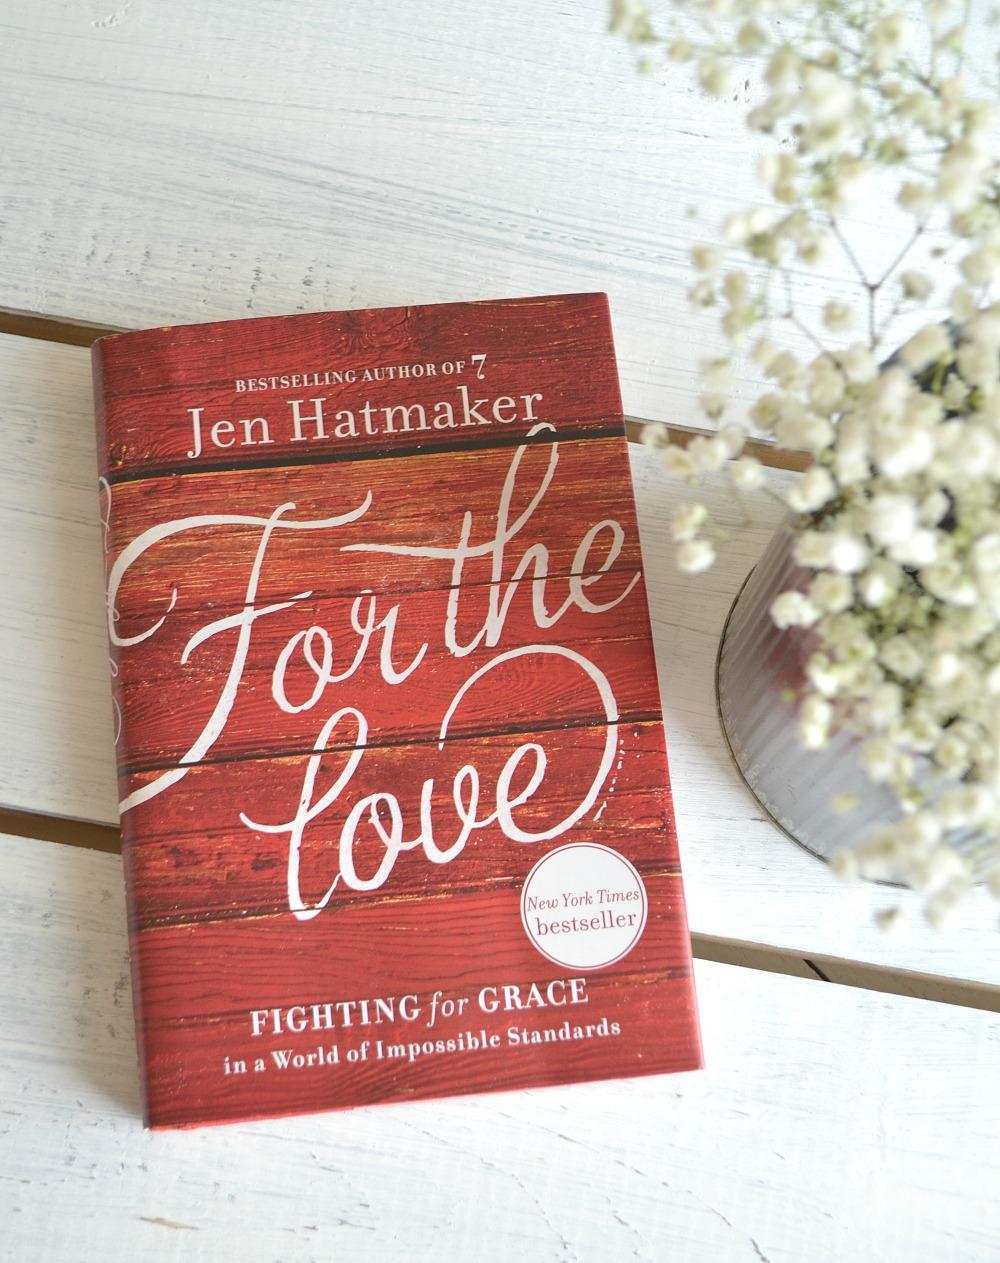 Friday Favorites: For the Love Book by Jen Hatmaker